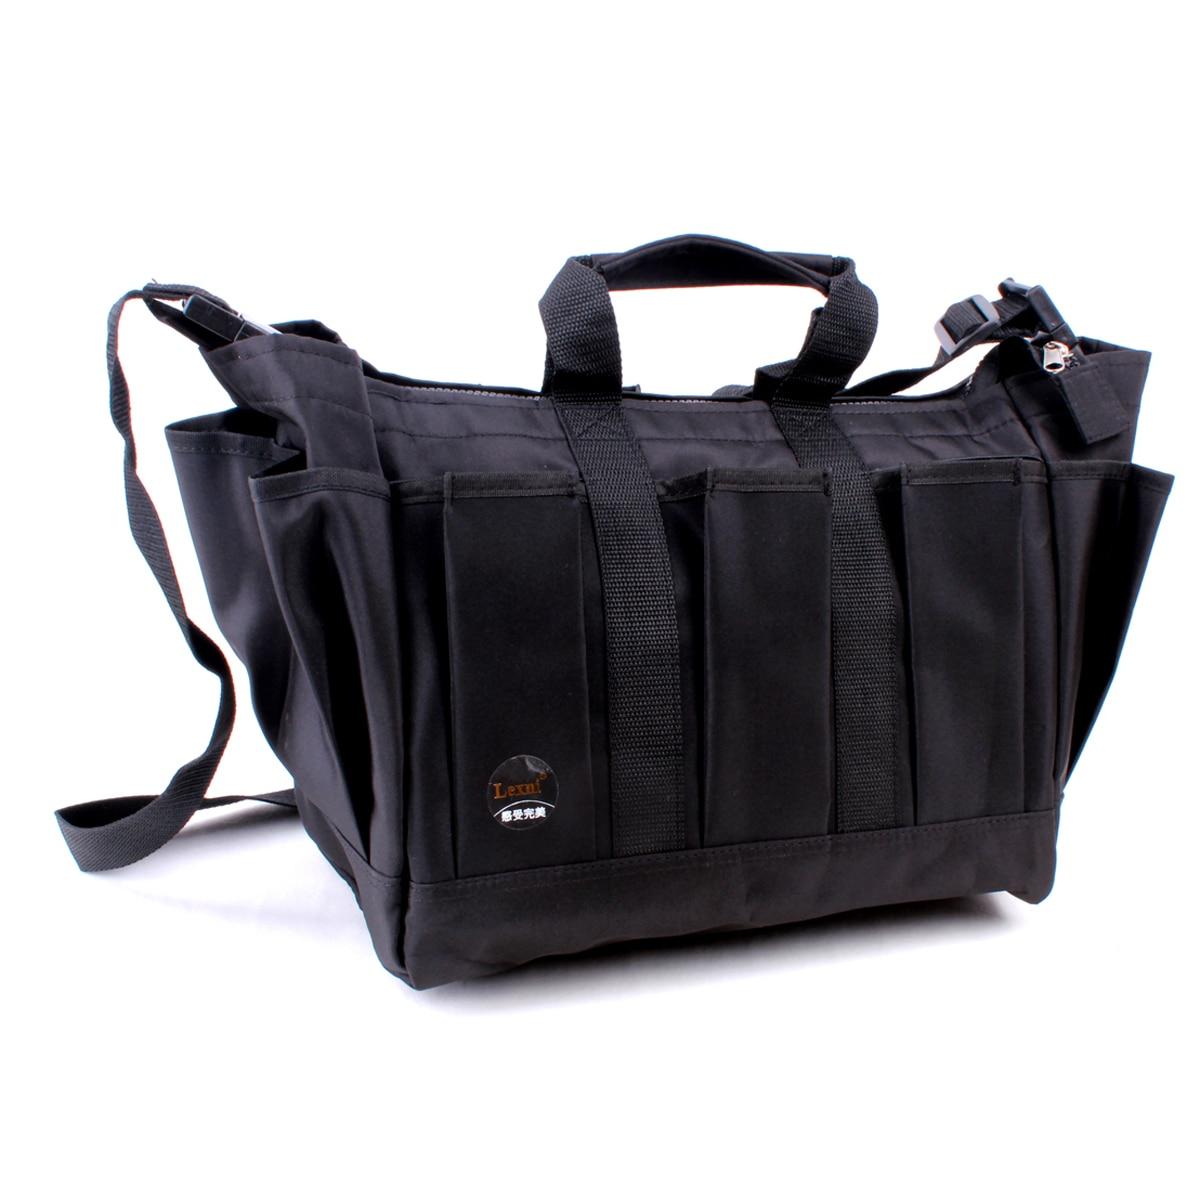 Portable Extra Large Hair Scissors Bag Waterproof XL Size Makeup Accessories Box Barber Case Adjustable Waist